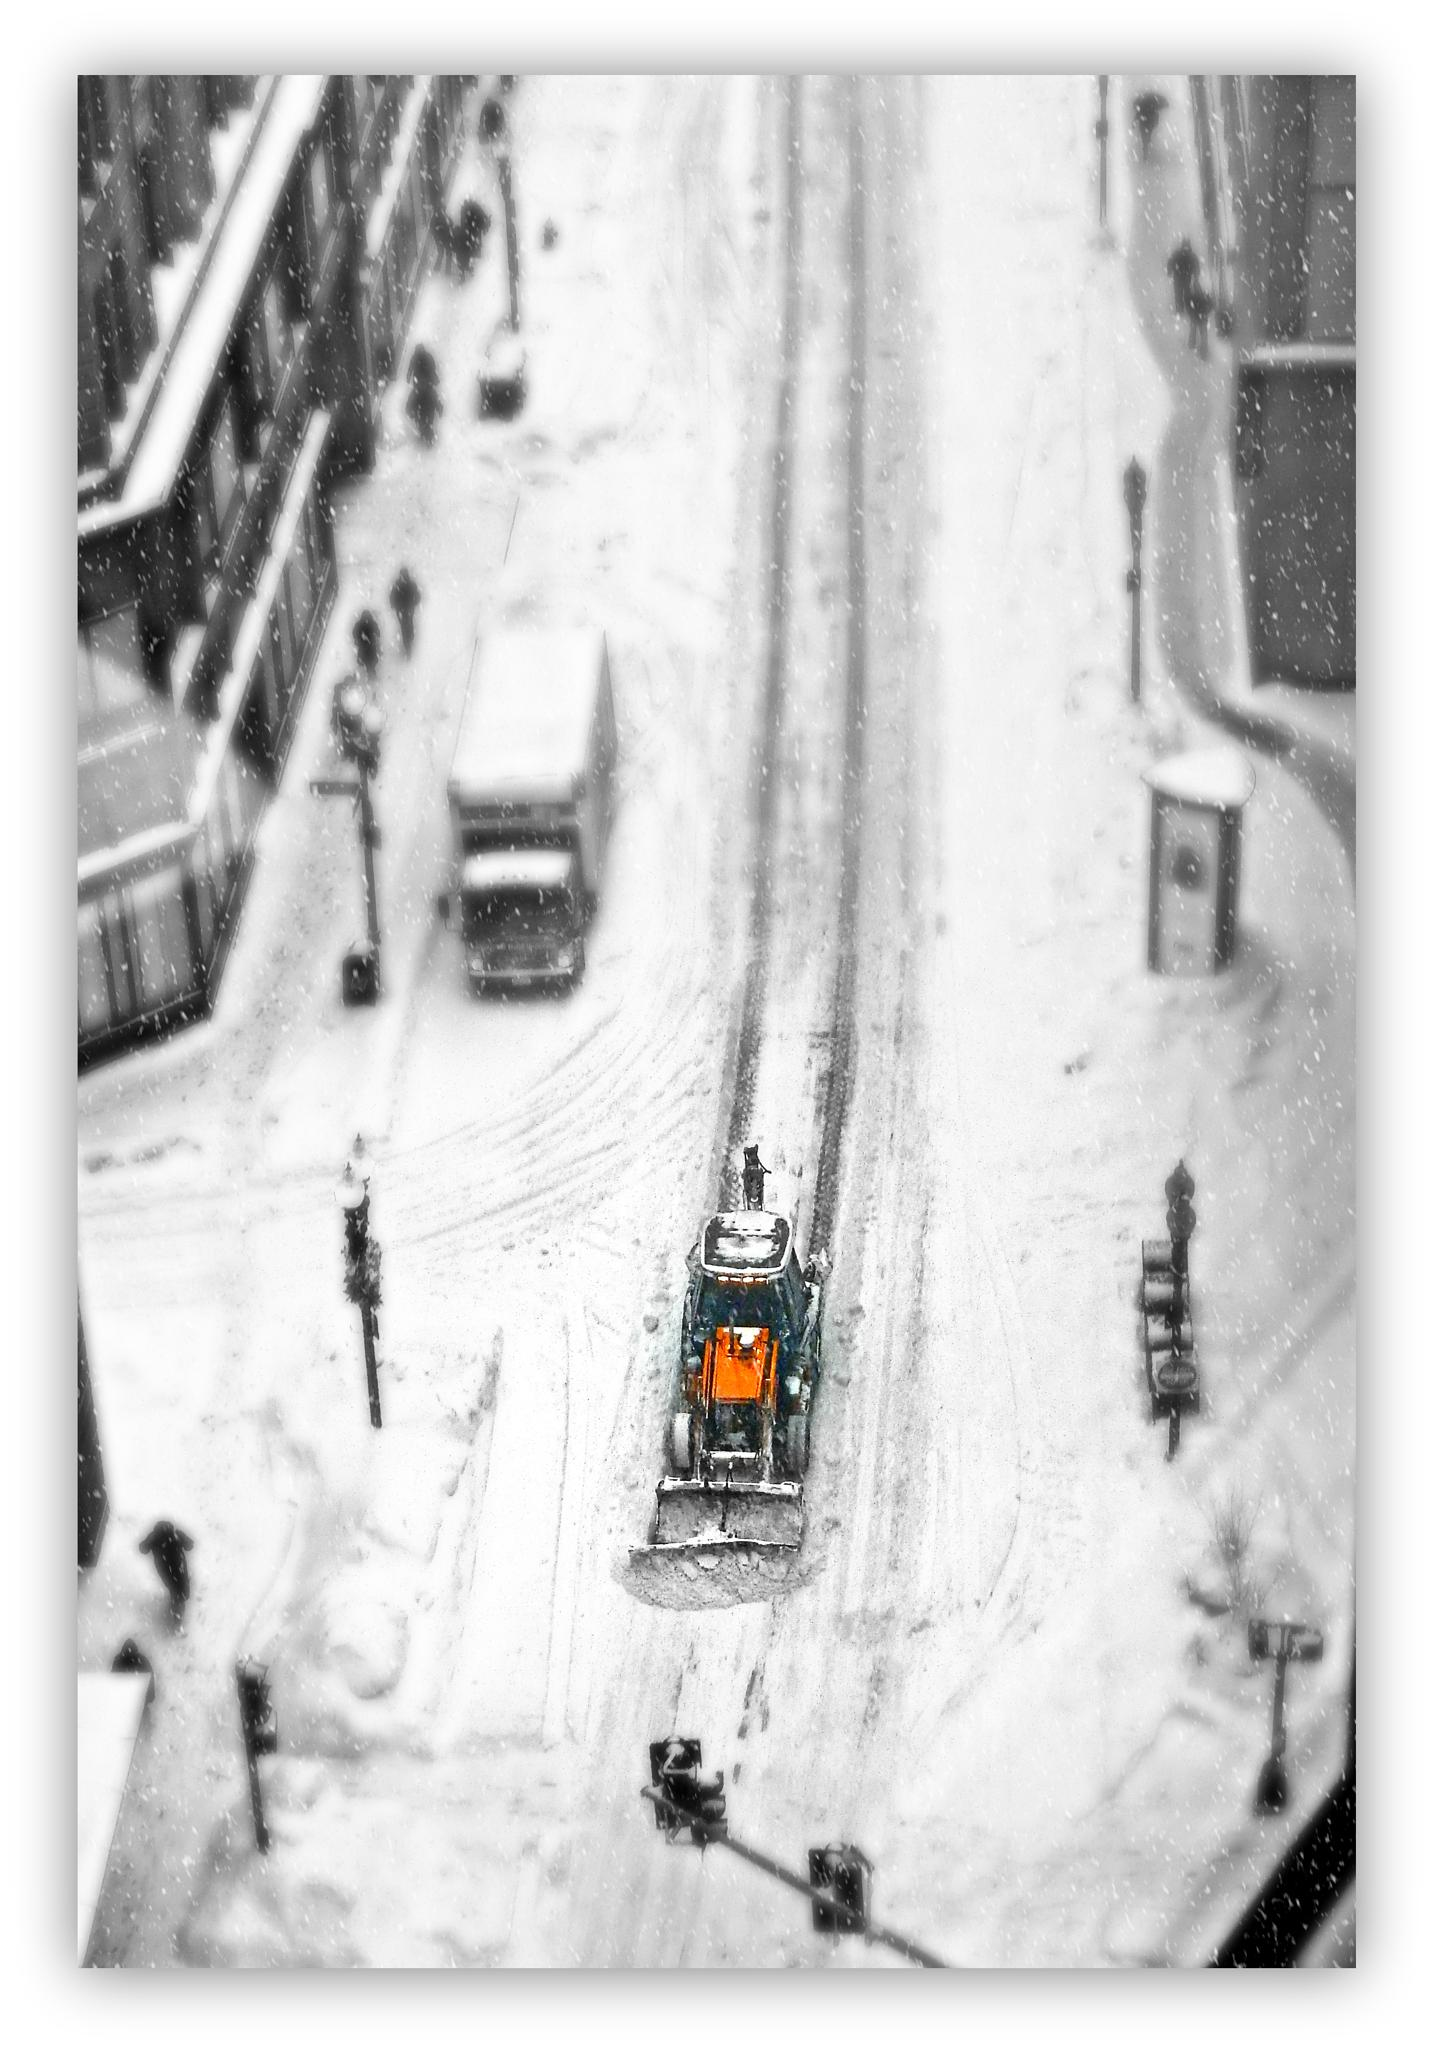 (Another) Snow Day by Dana Wiehl